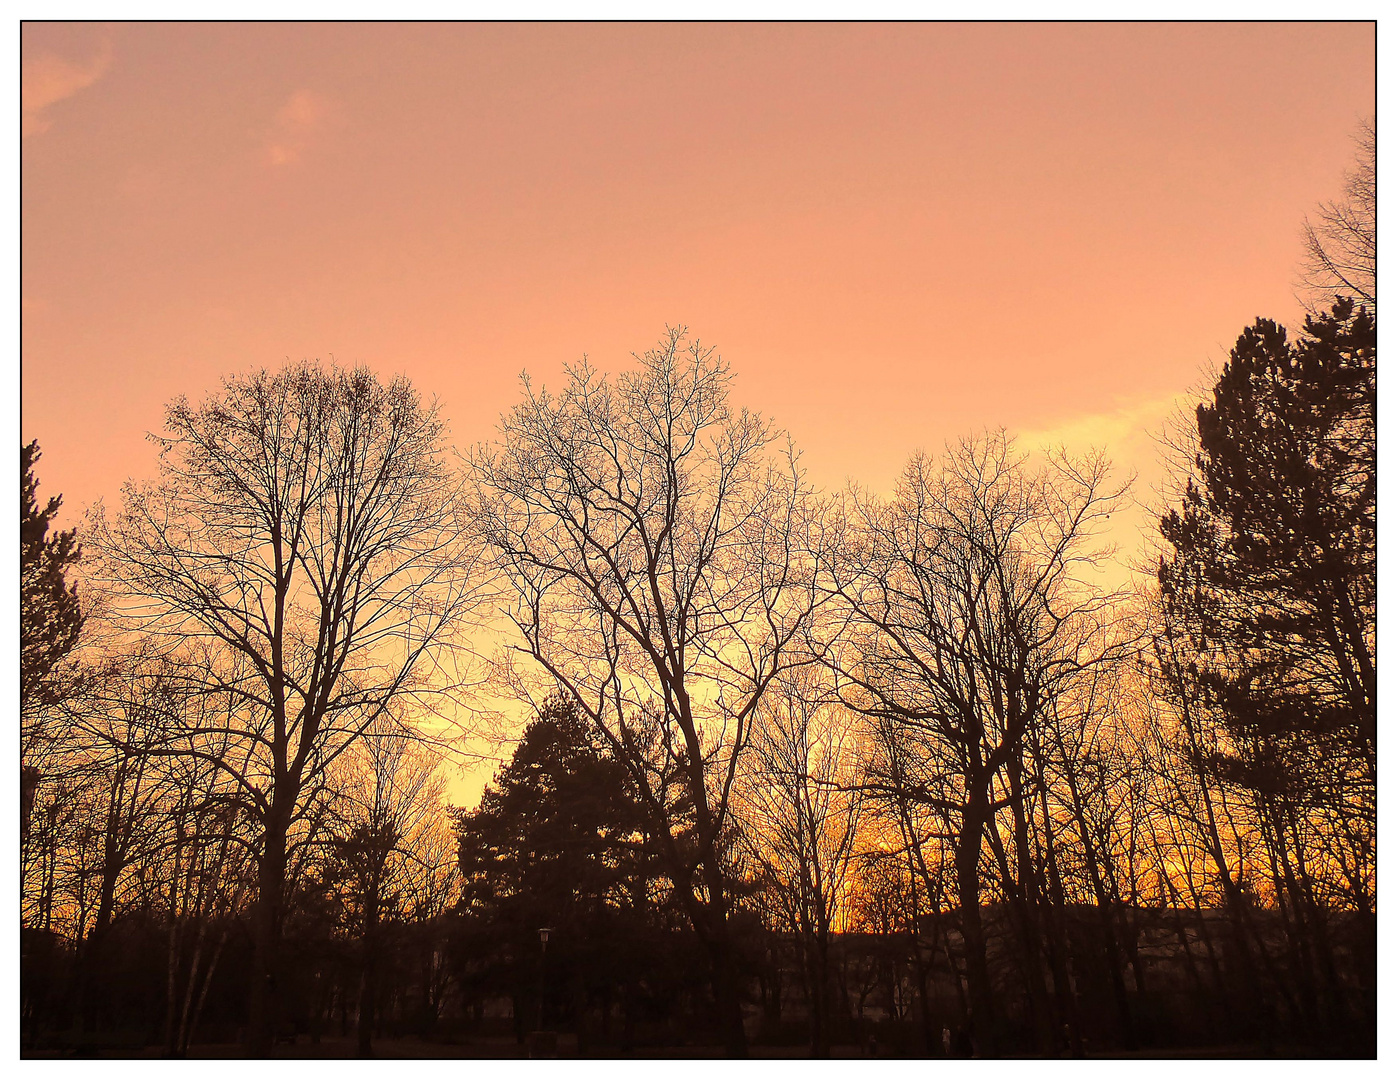 Sonnenuntergang an einem Frühlingstag